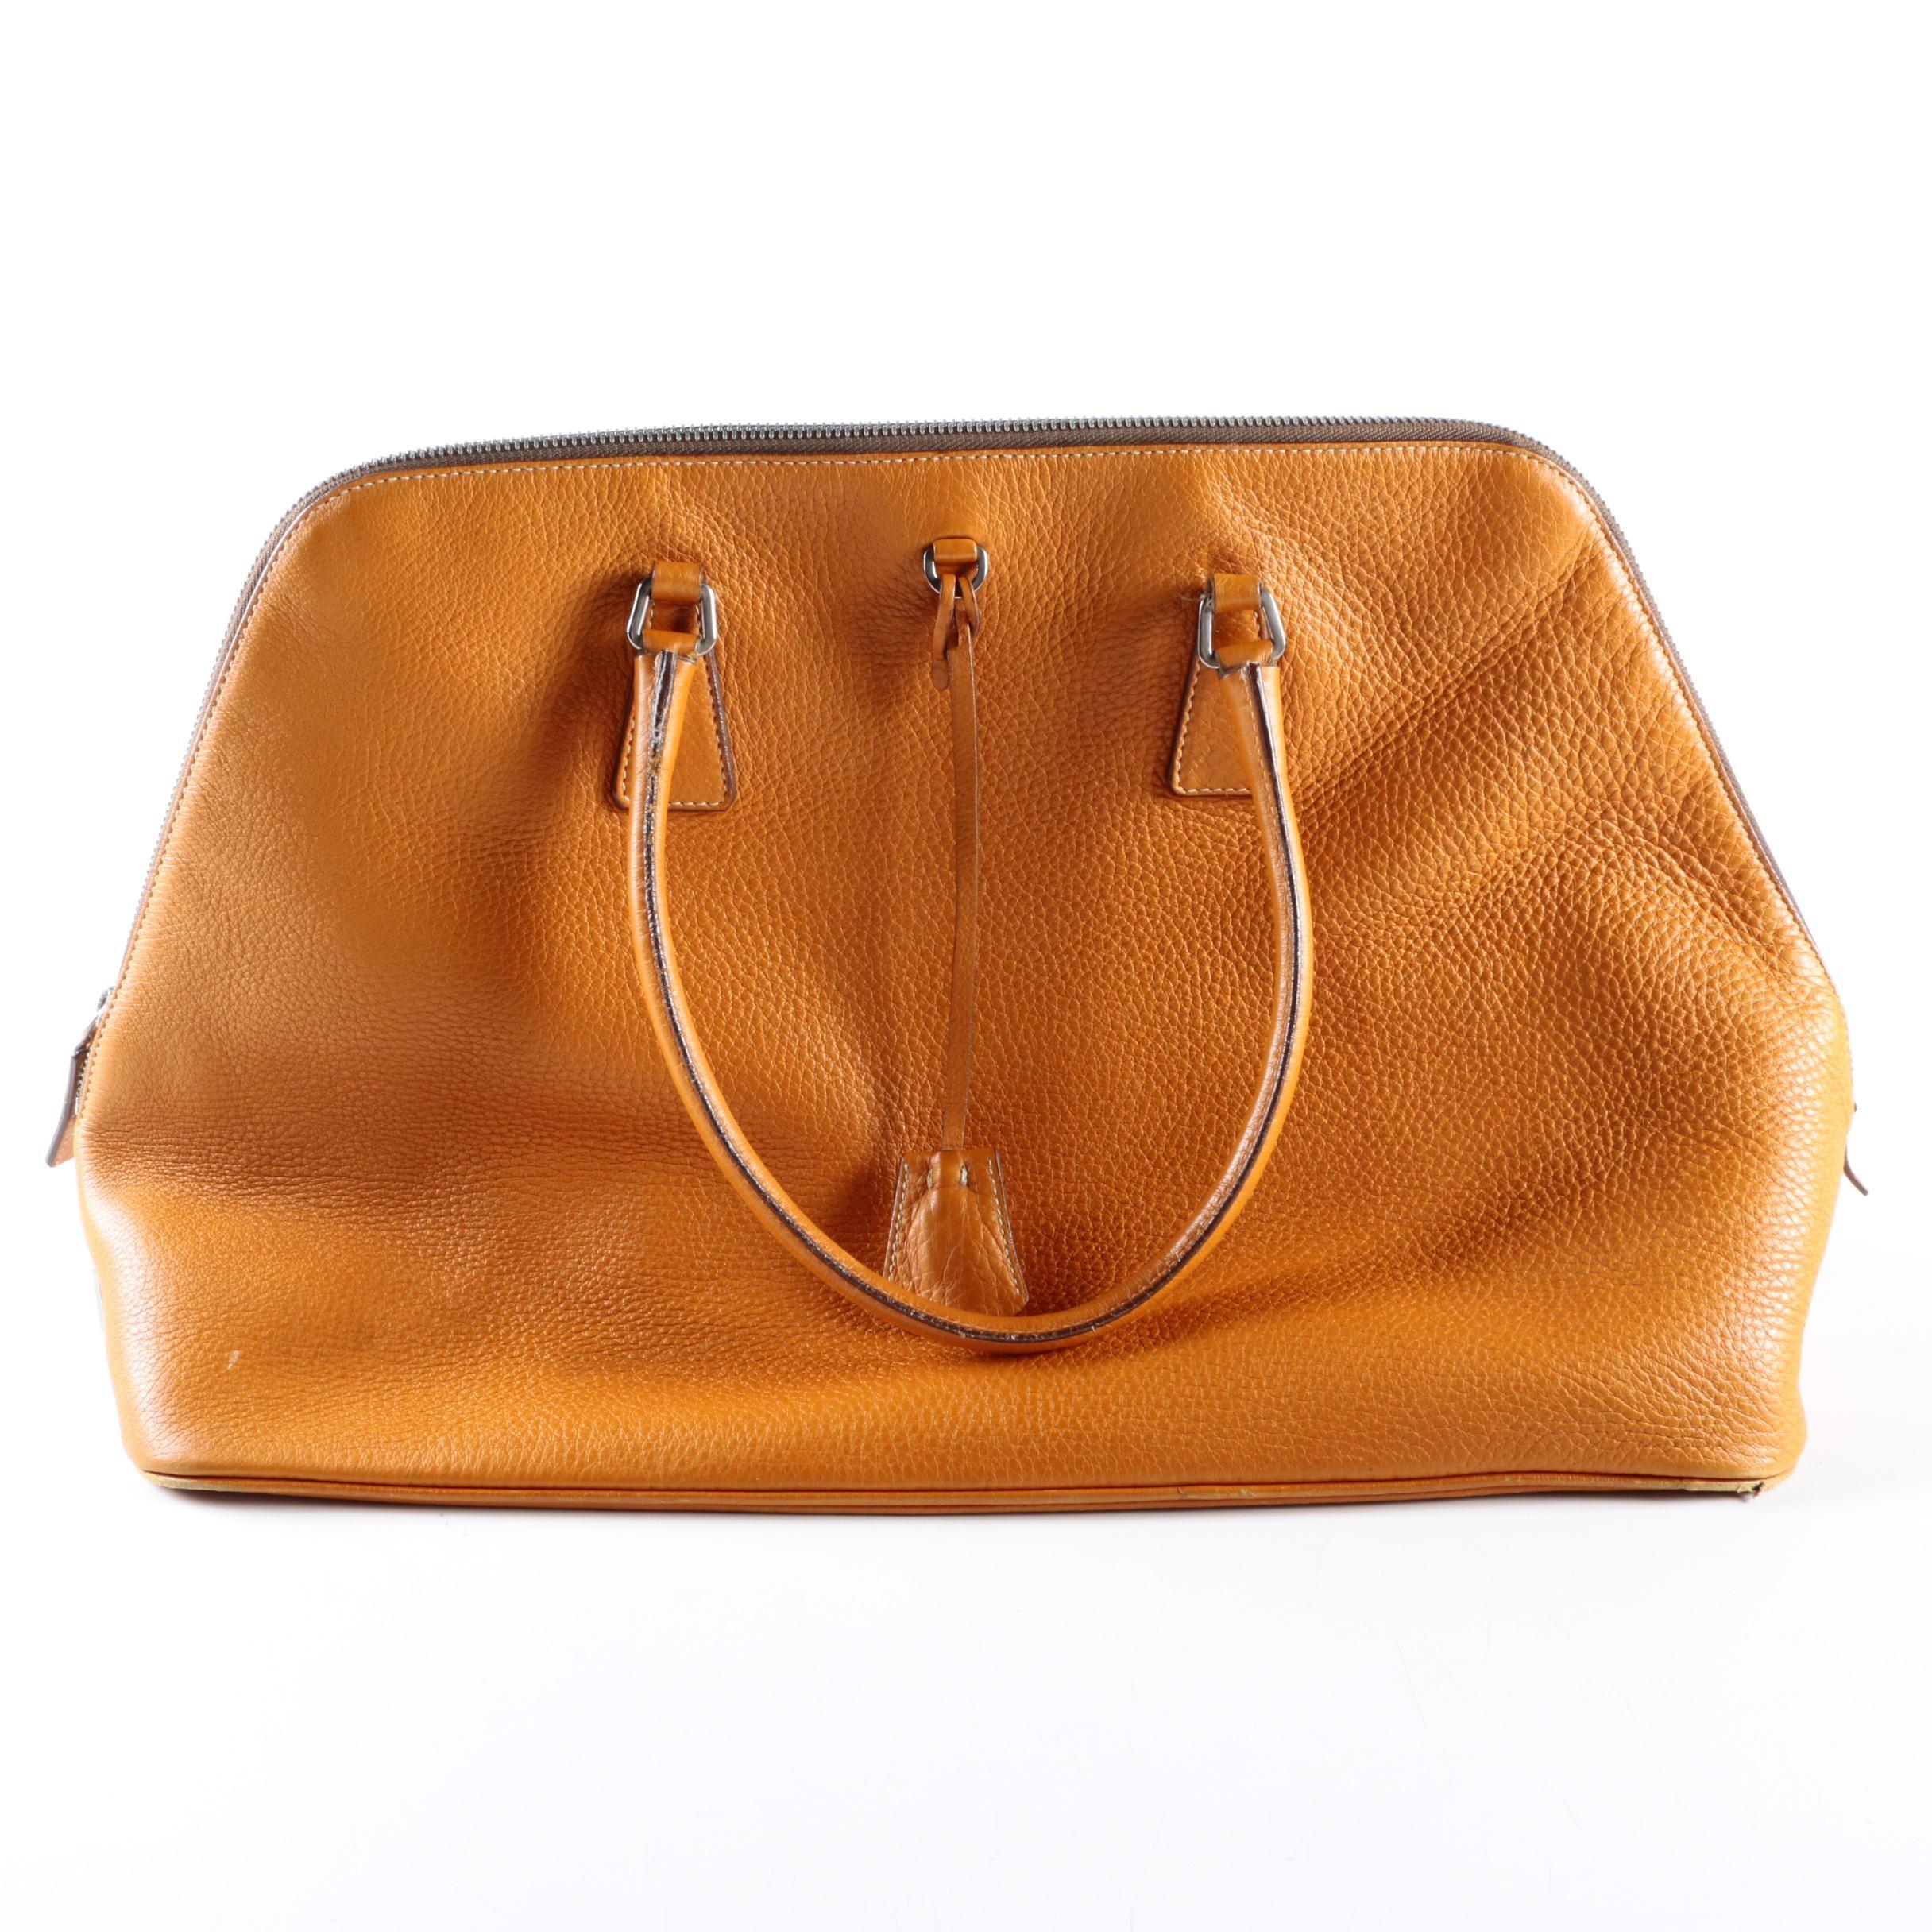 Prada Orange Leather Satchel Handbag